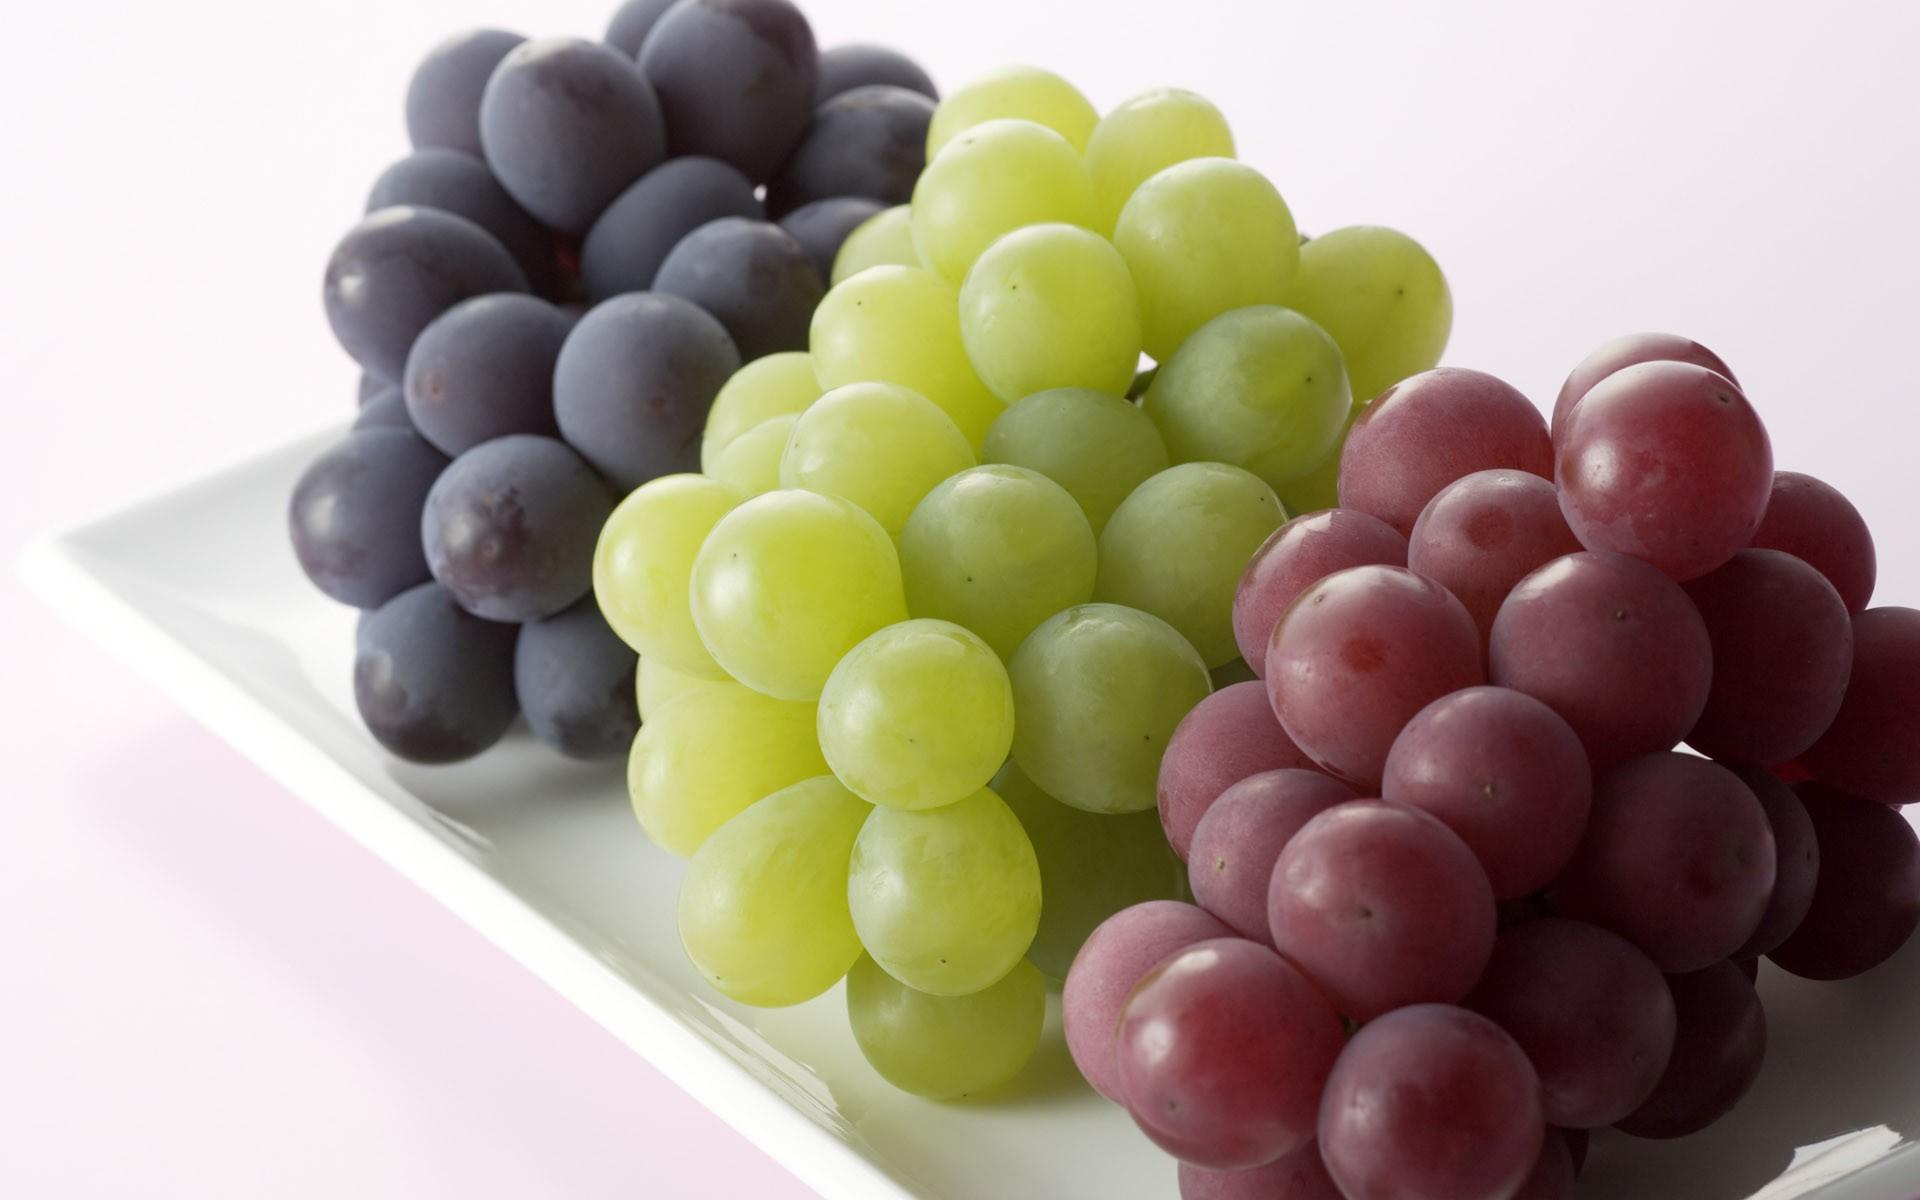 Three color grapes photos